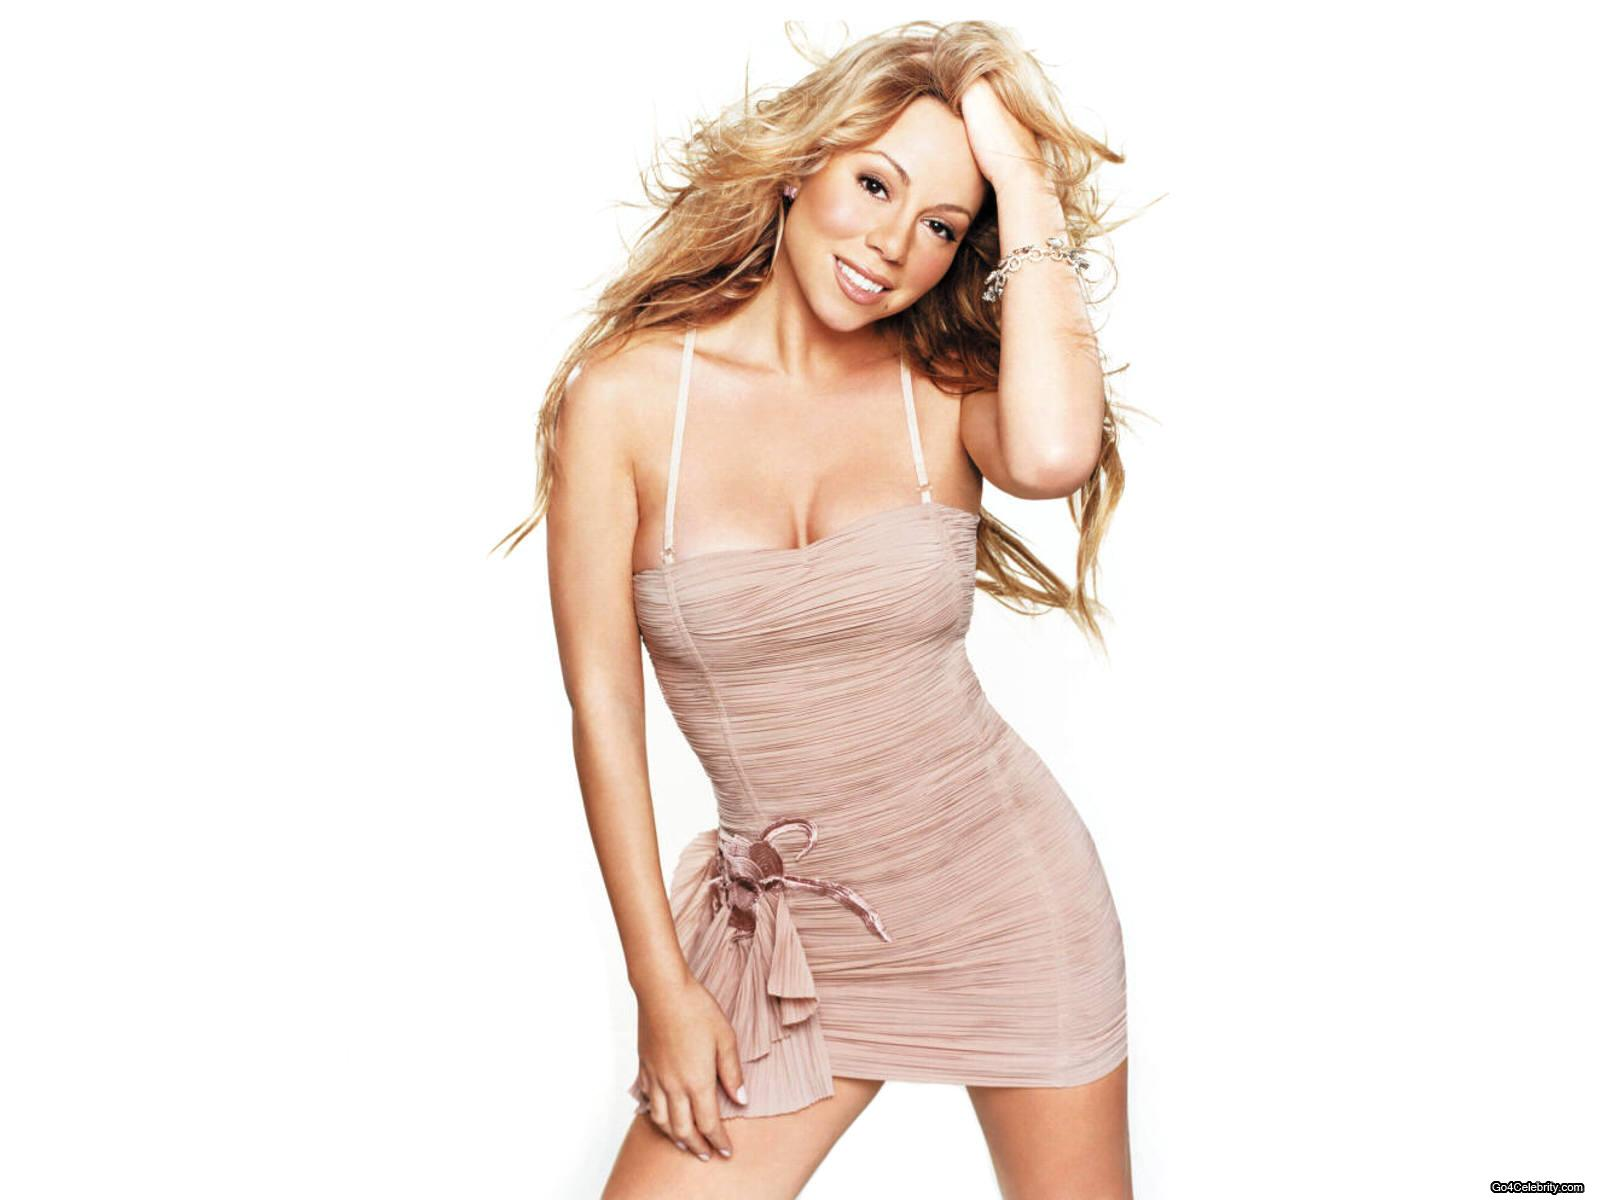 latest wallpapers download: mariah carey Mariah Carey